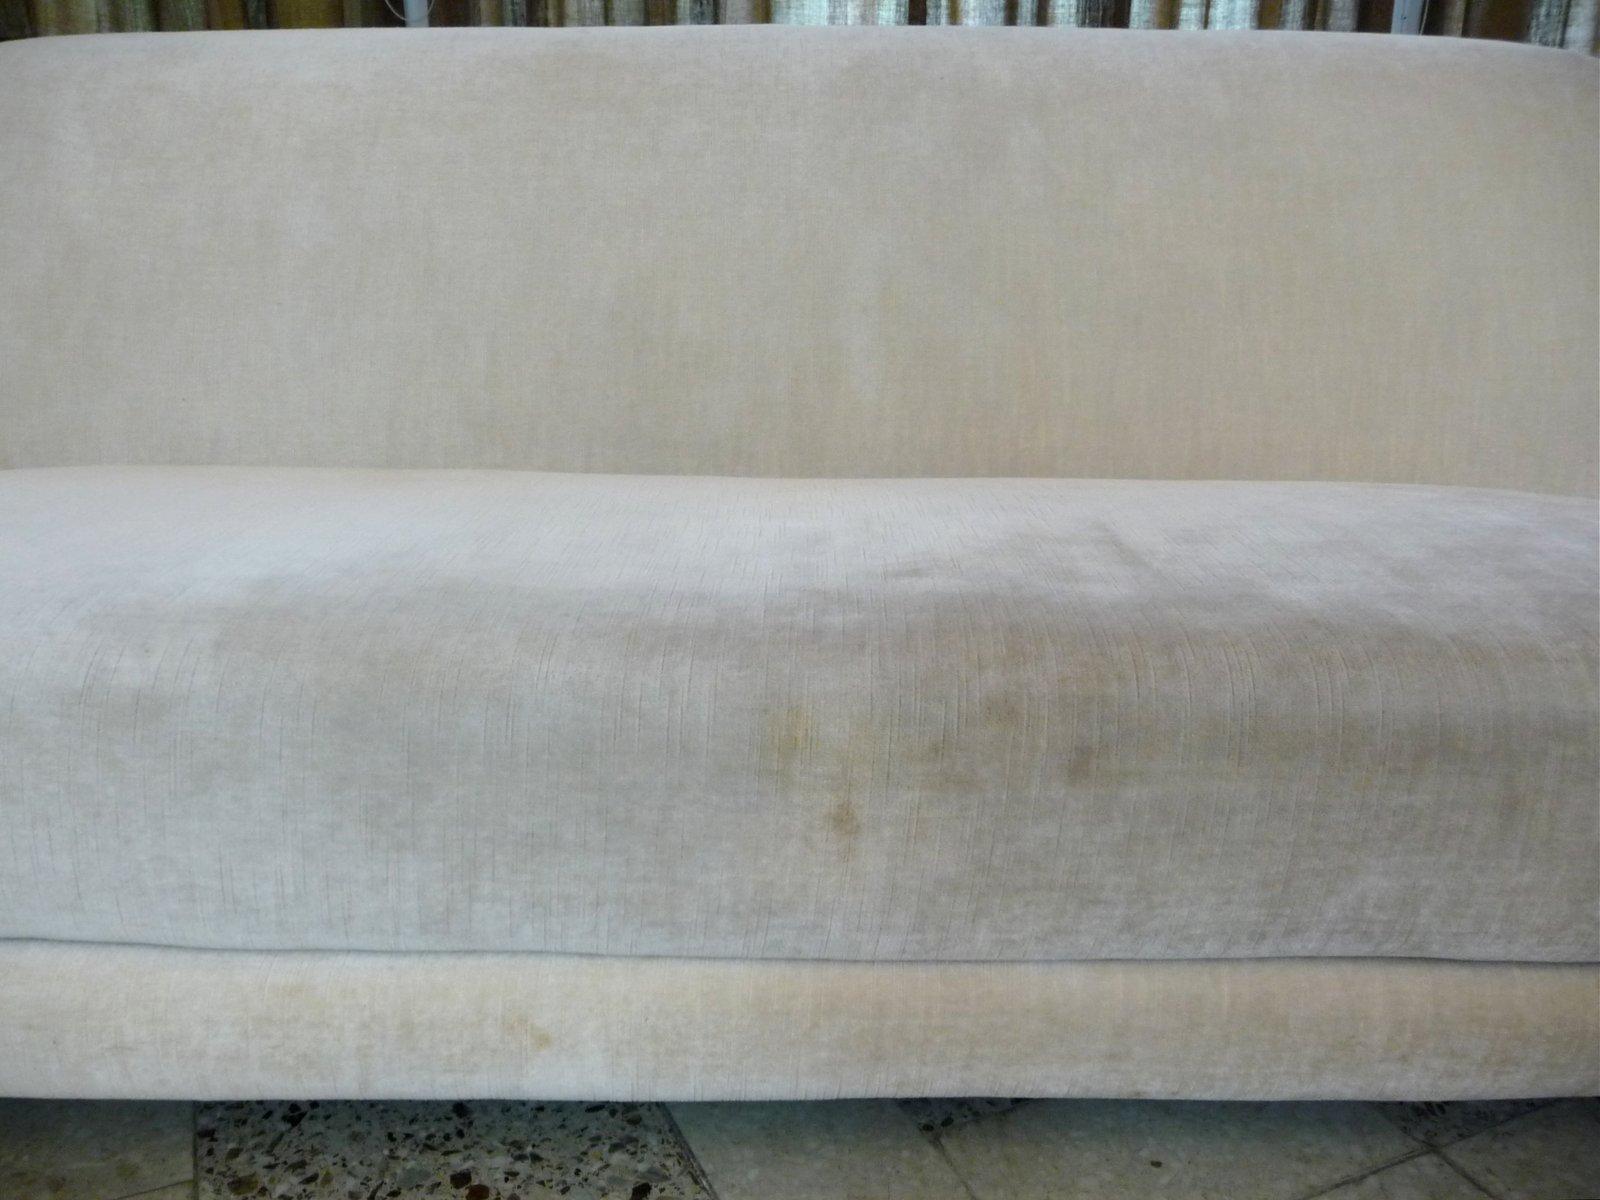 Italian Mohair Velvet Three Seater Sofa 1950s for sale at Pamono